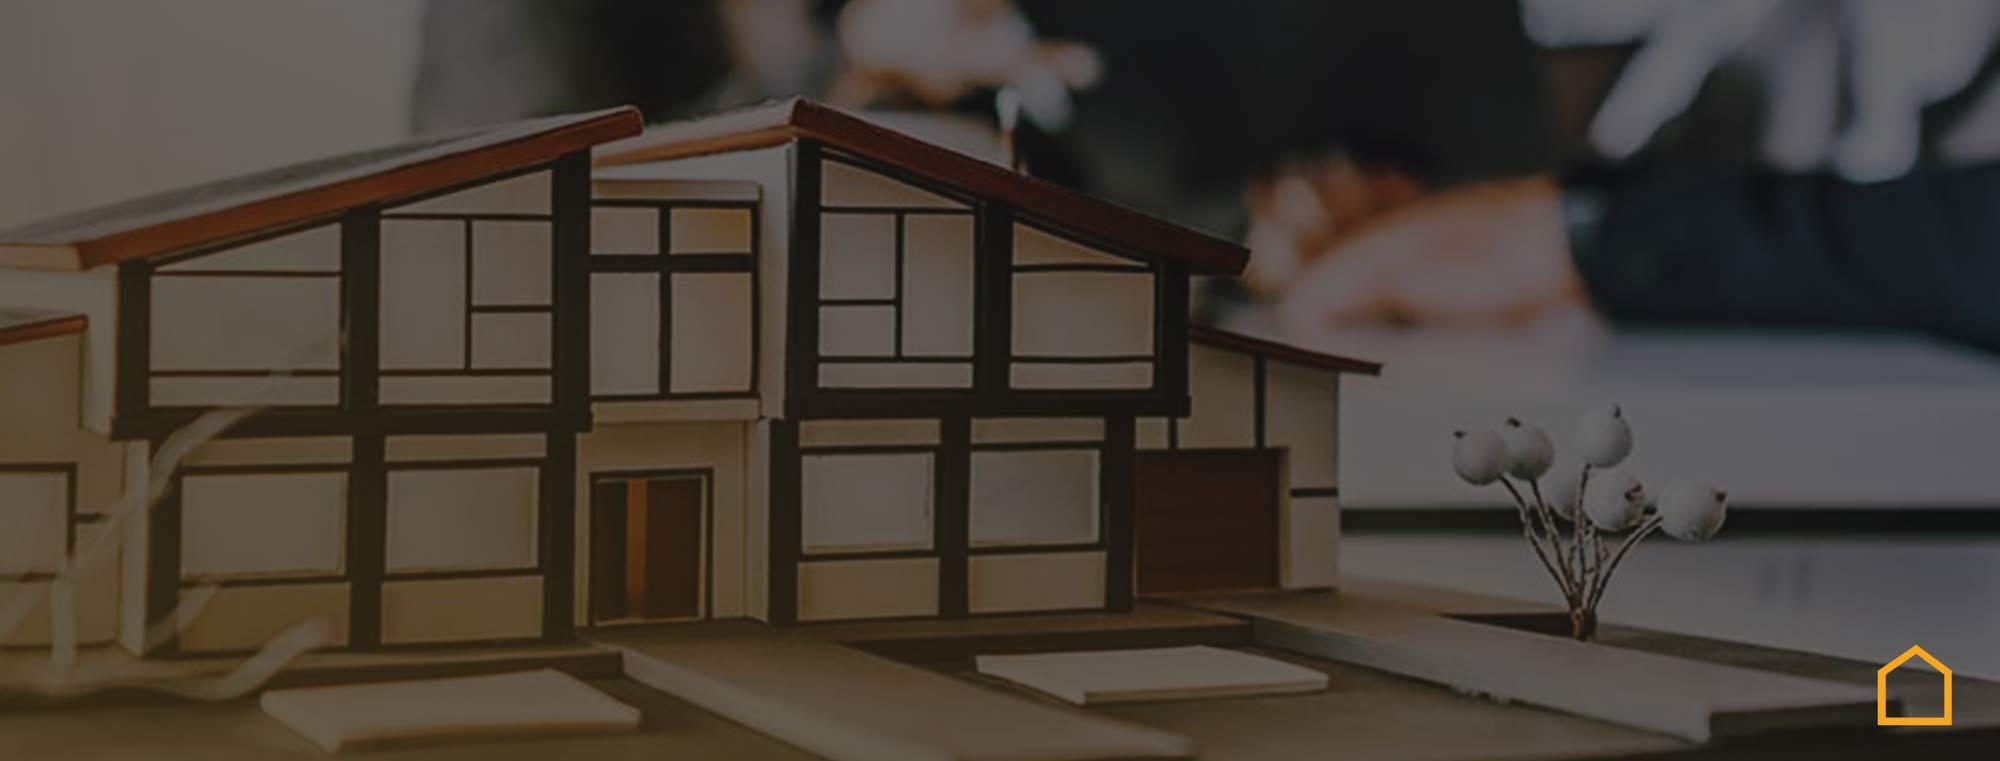 city immobilienmakler lexikon architektur